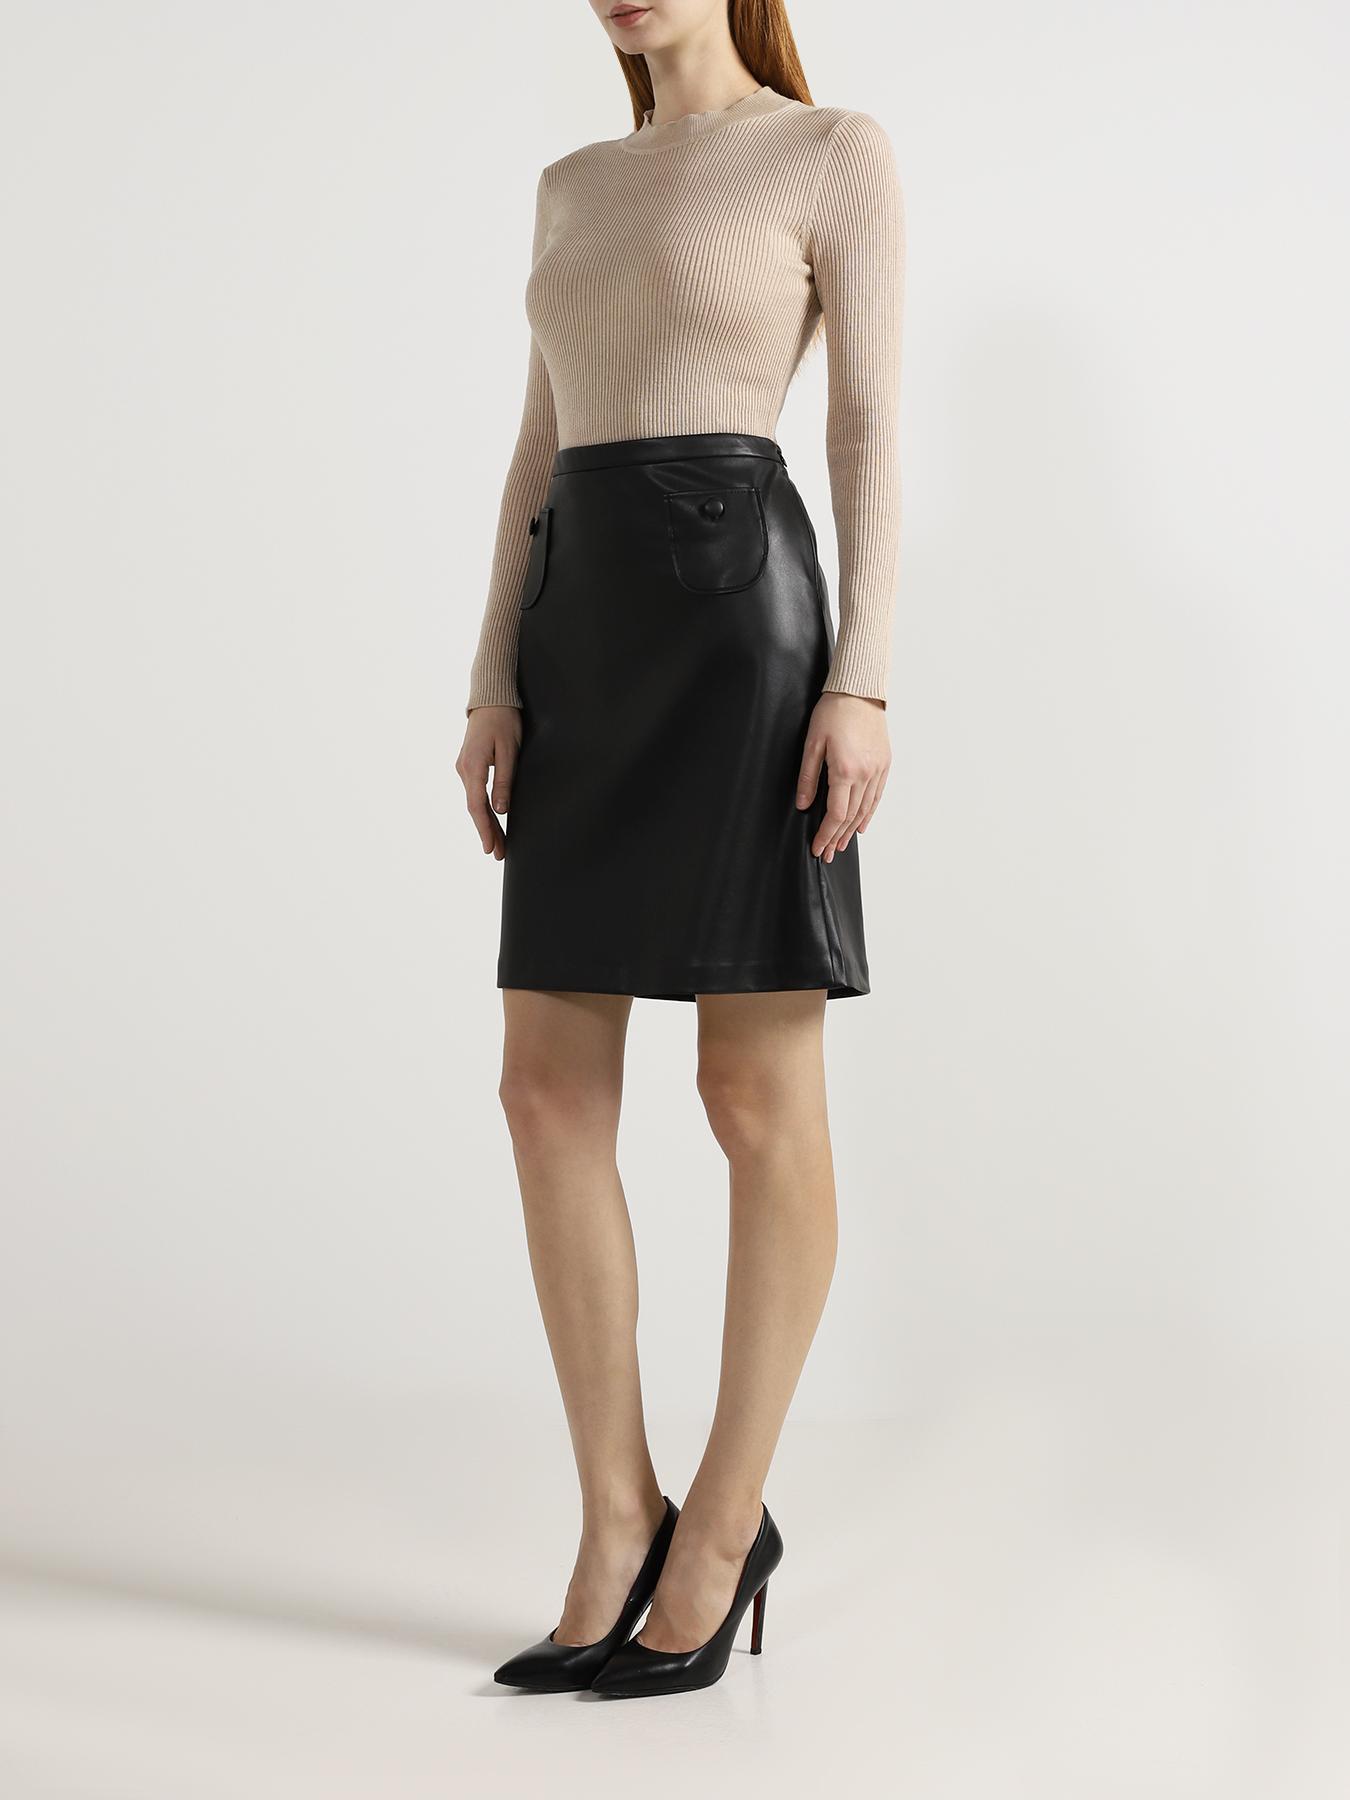 Korpo Two Однотонная юбка от Korpo Two